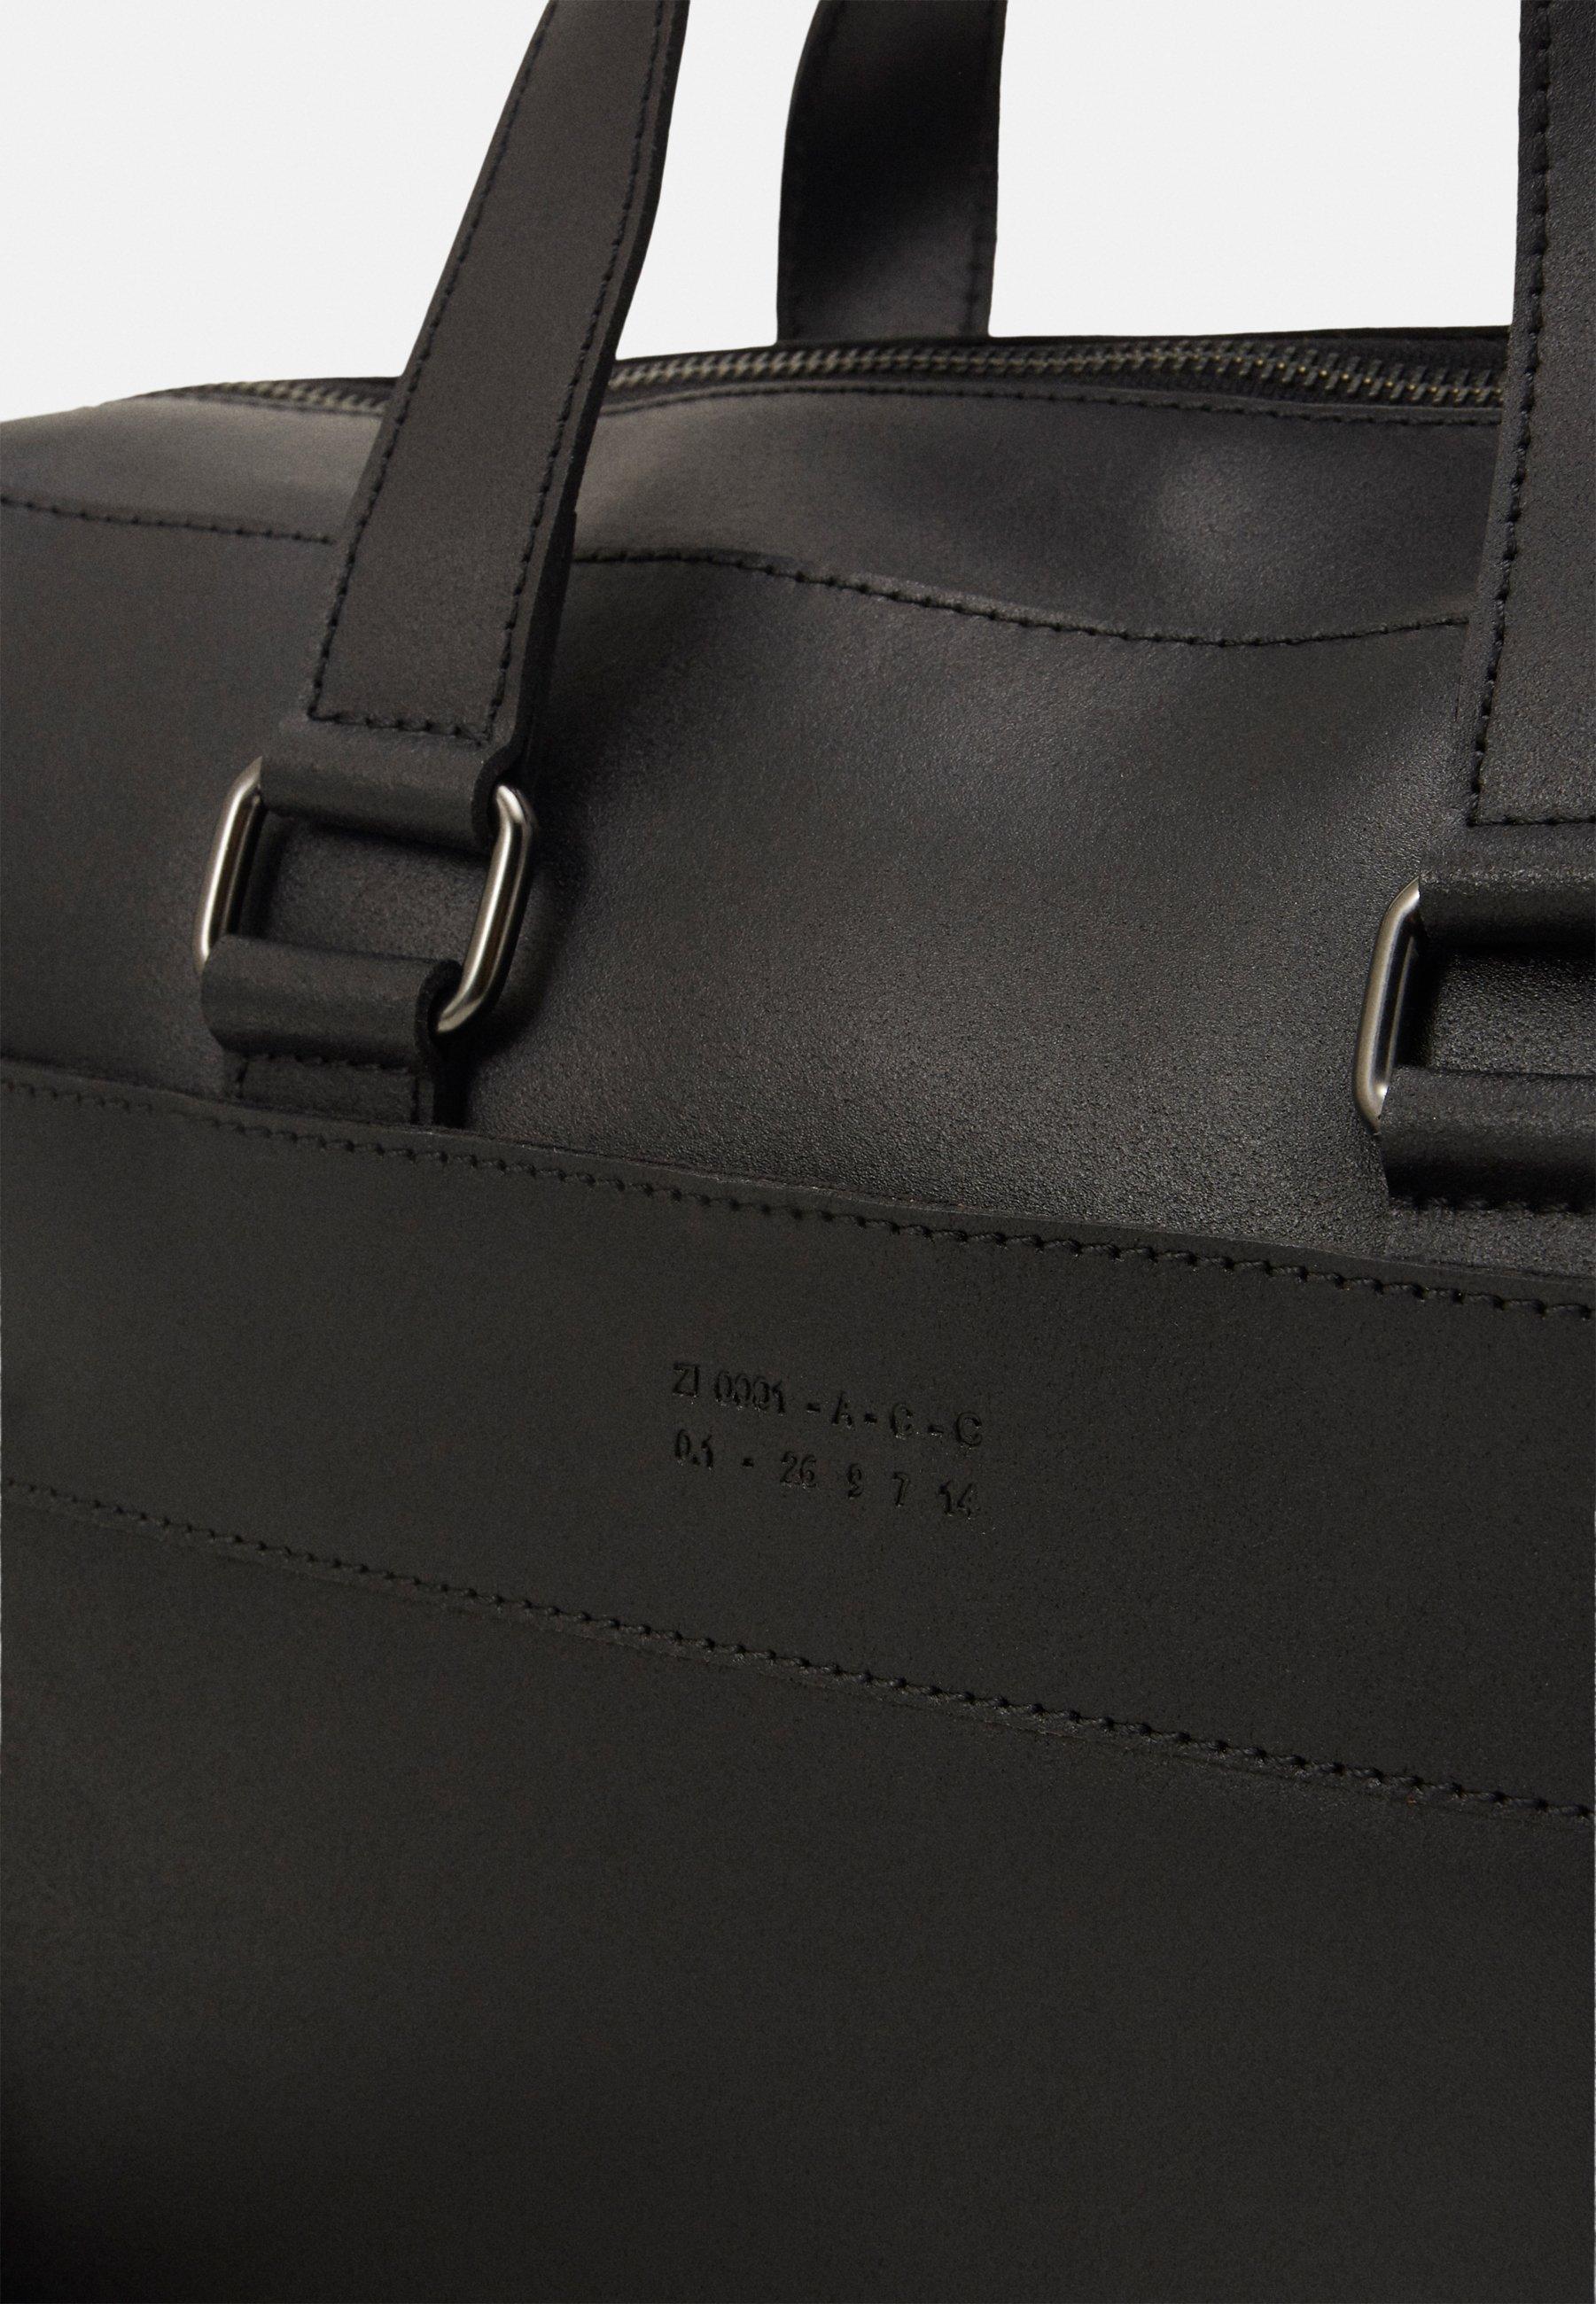 Zign LEATHER - Stresskoffert - black/svart PXW8yjSF65mXLT0